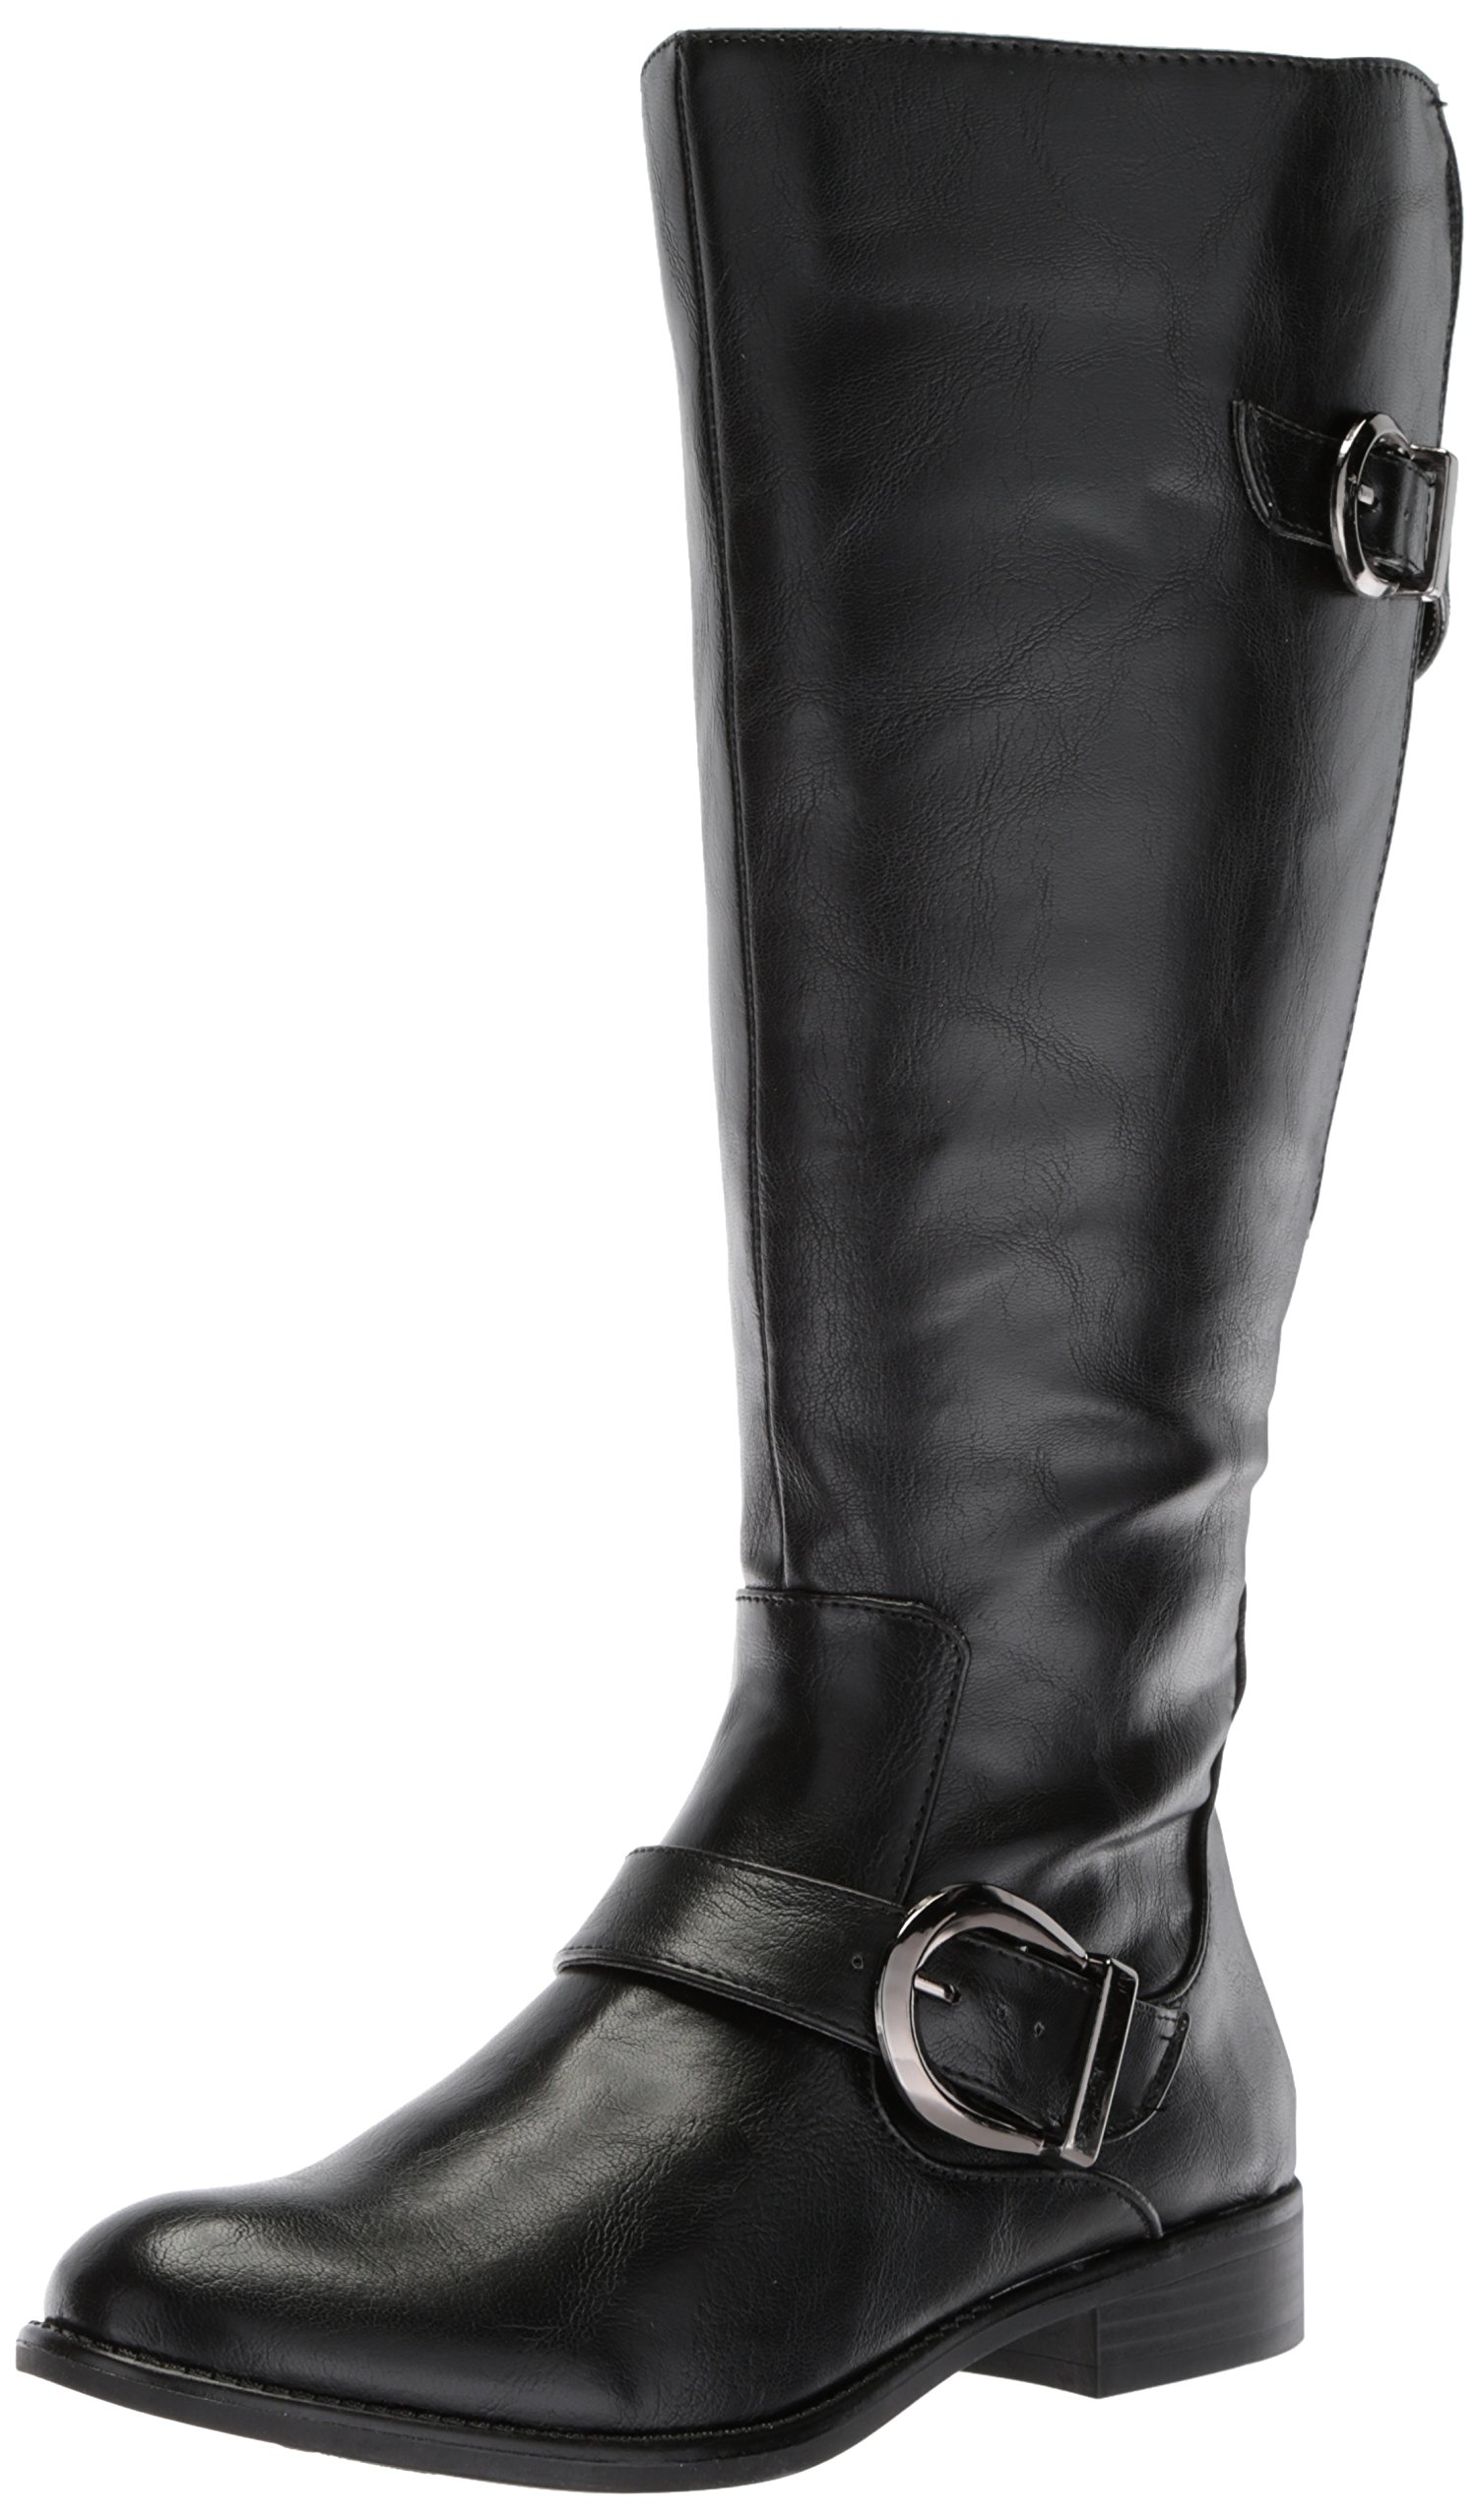 LifeStride Women's Rosaria-WC Equestrian Boot, Black Wc,11M